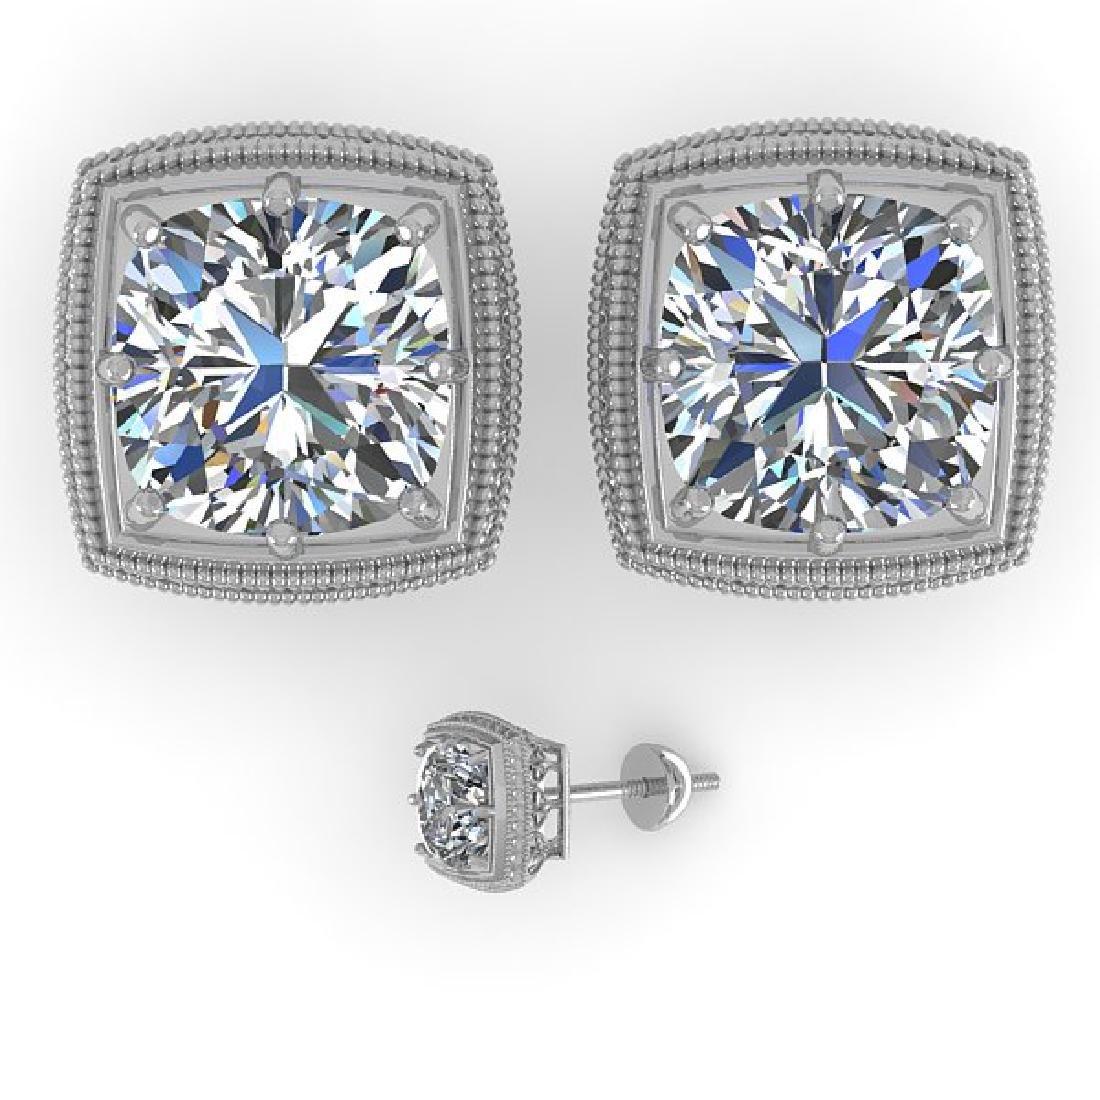 2 CTW VS/SI Cushion Cut Diamond Stud Earrings Deco 18K - 2